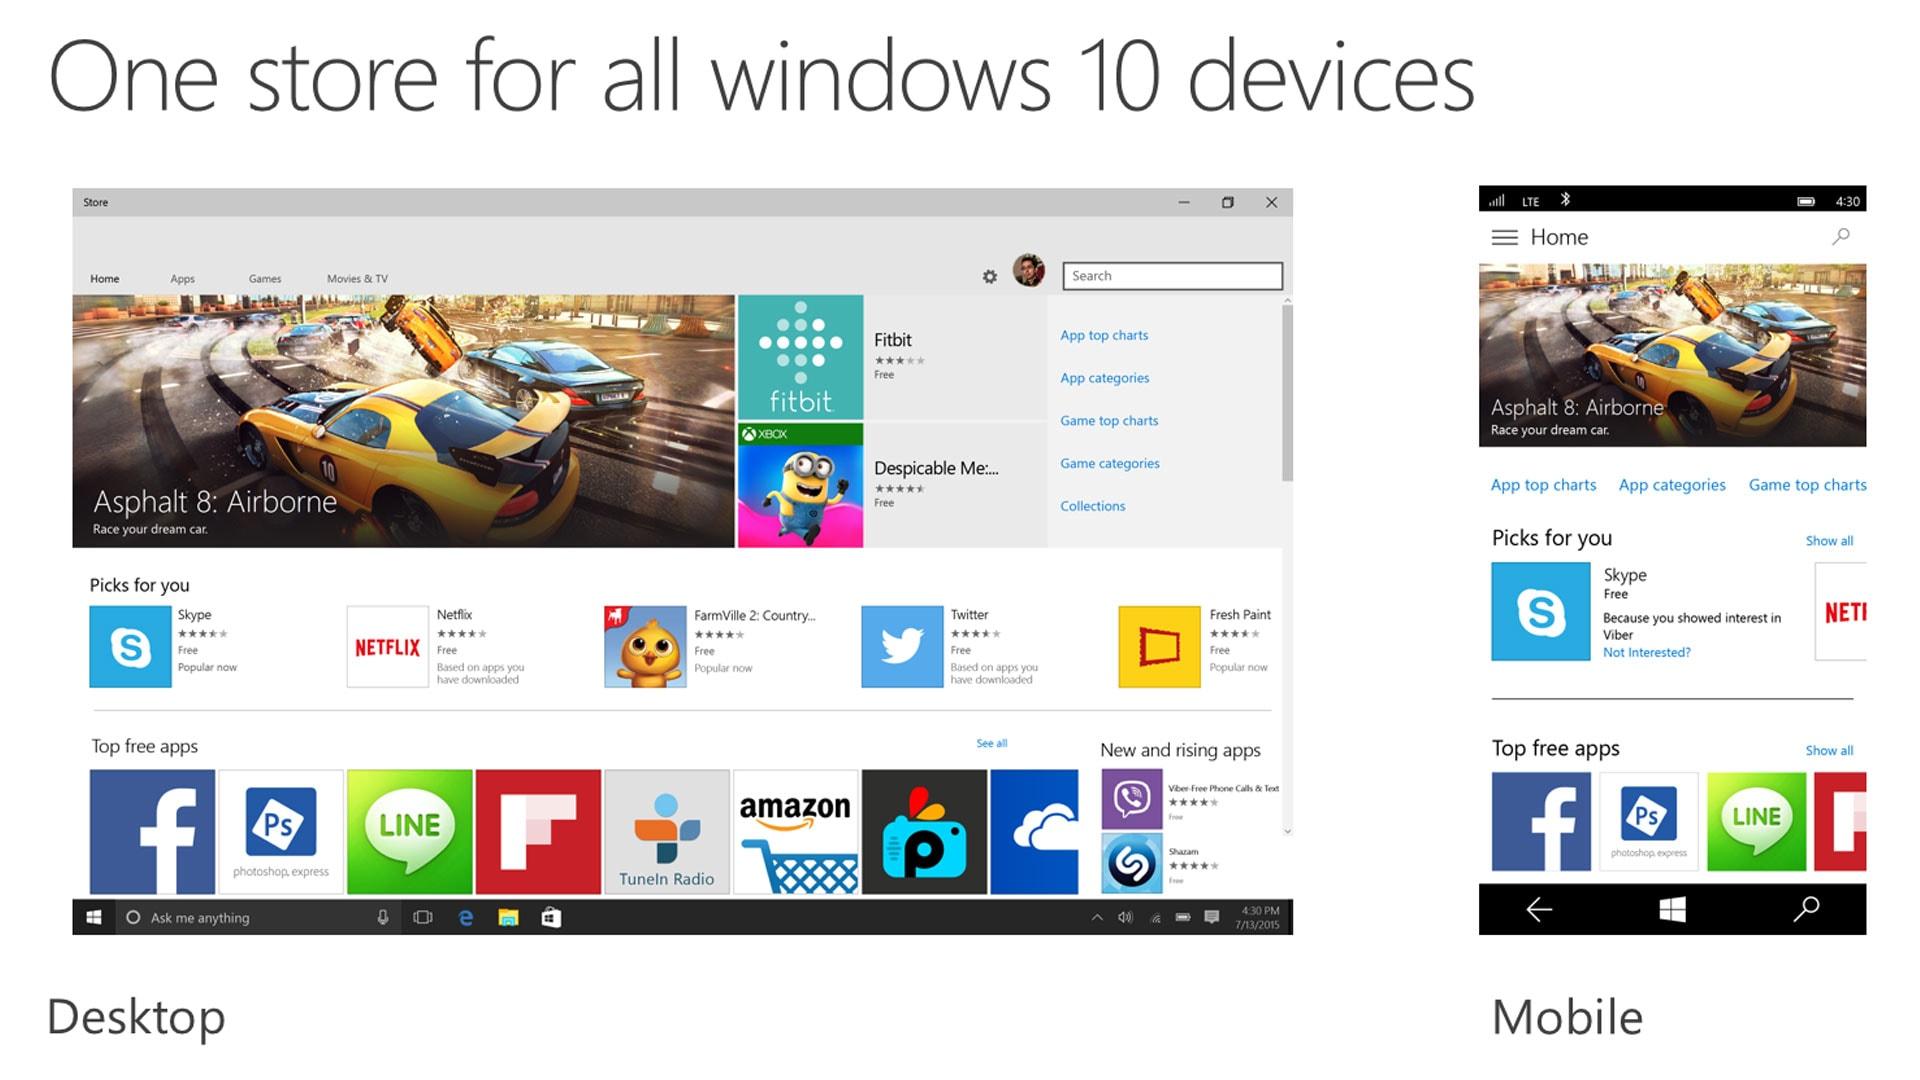 Windows 10 application development store for UWP apps